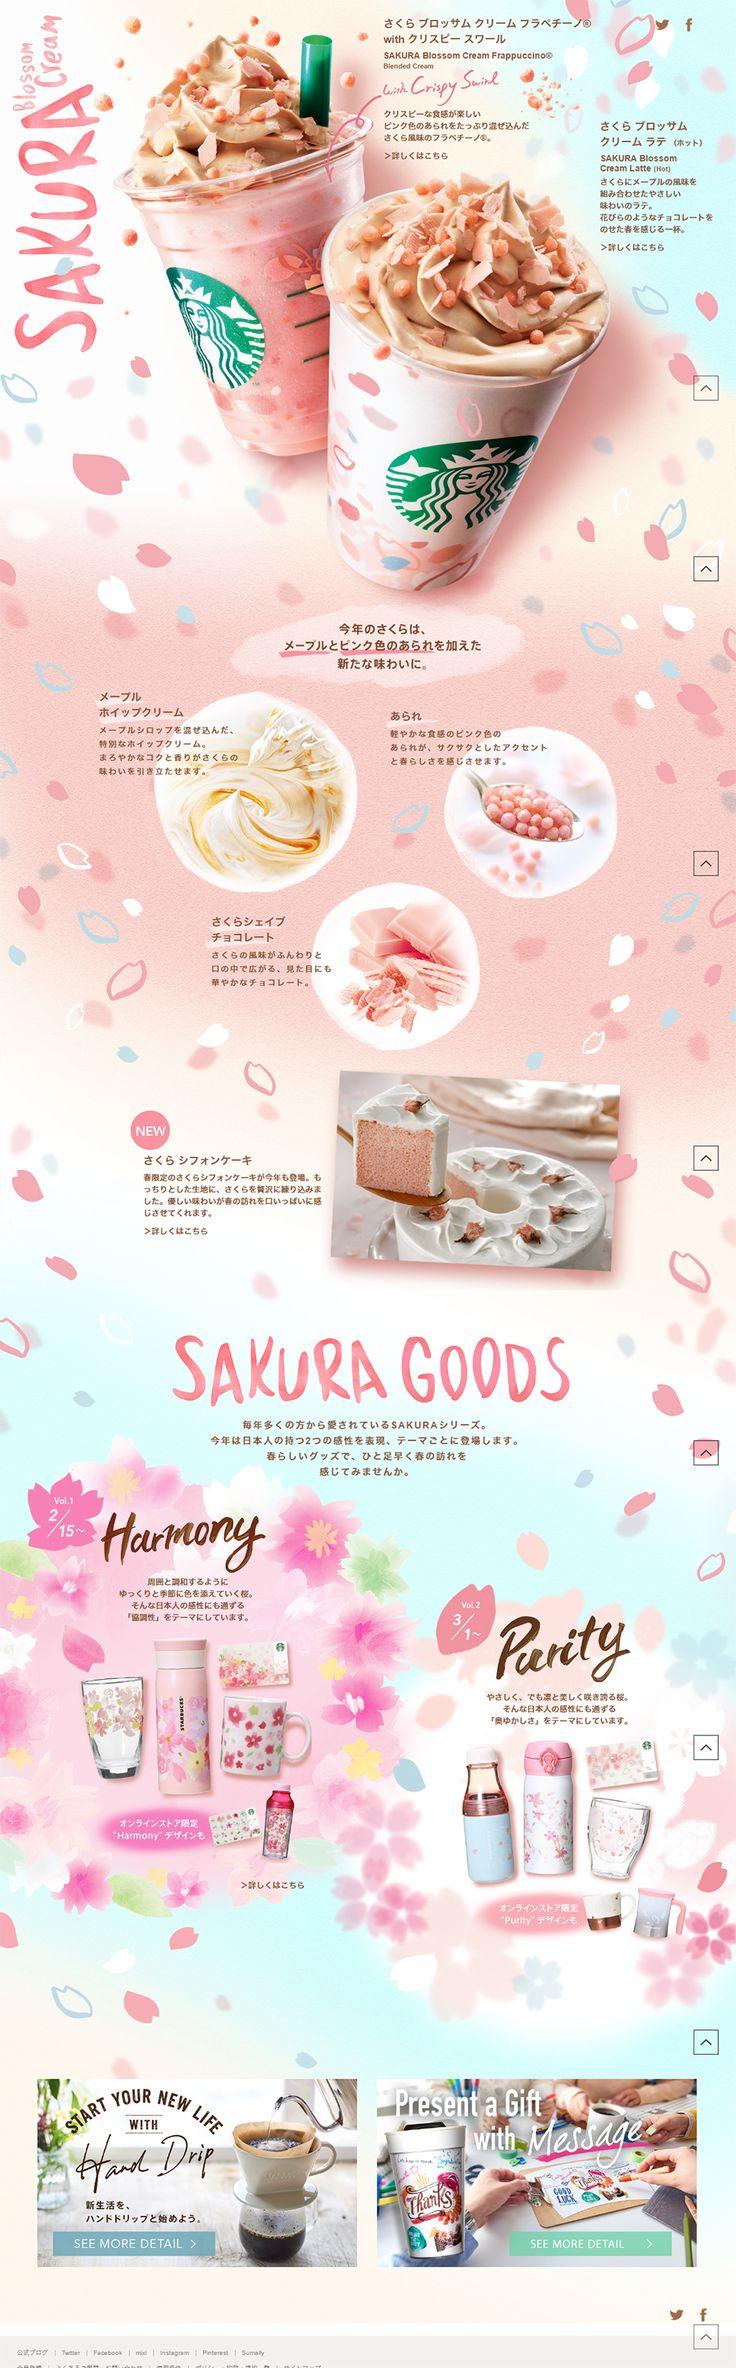 SAKURA Blossom Cream